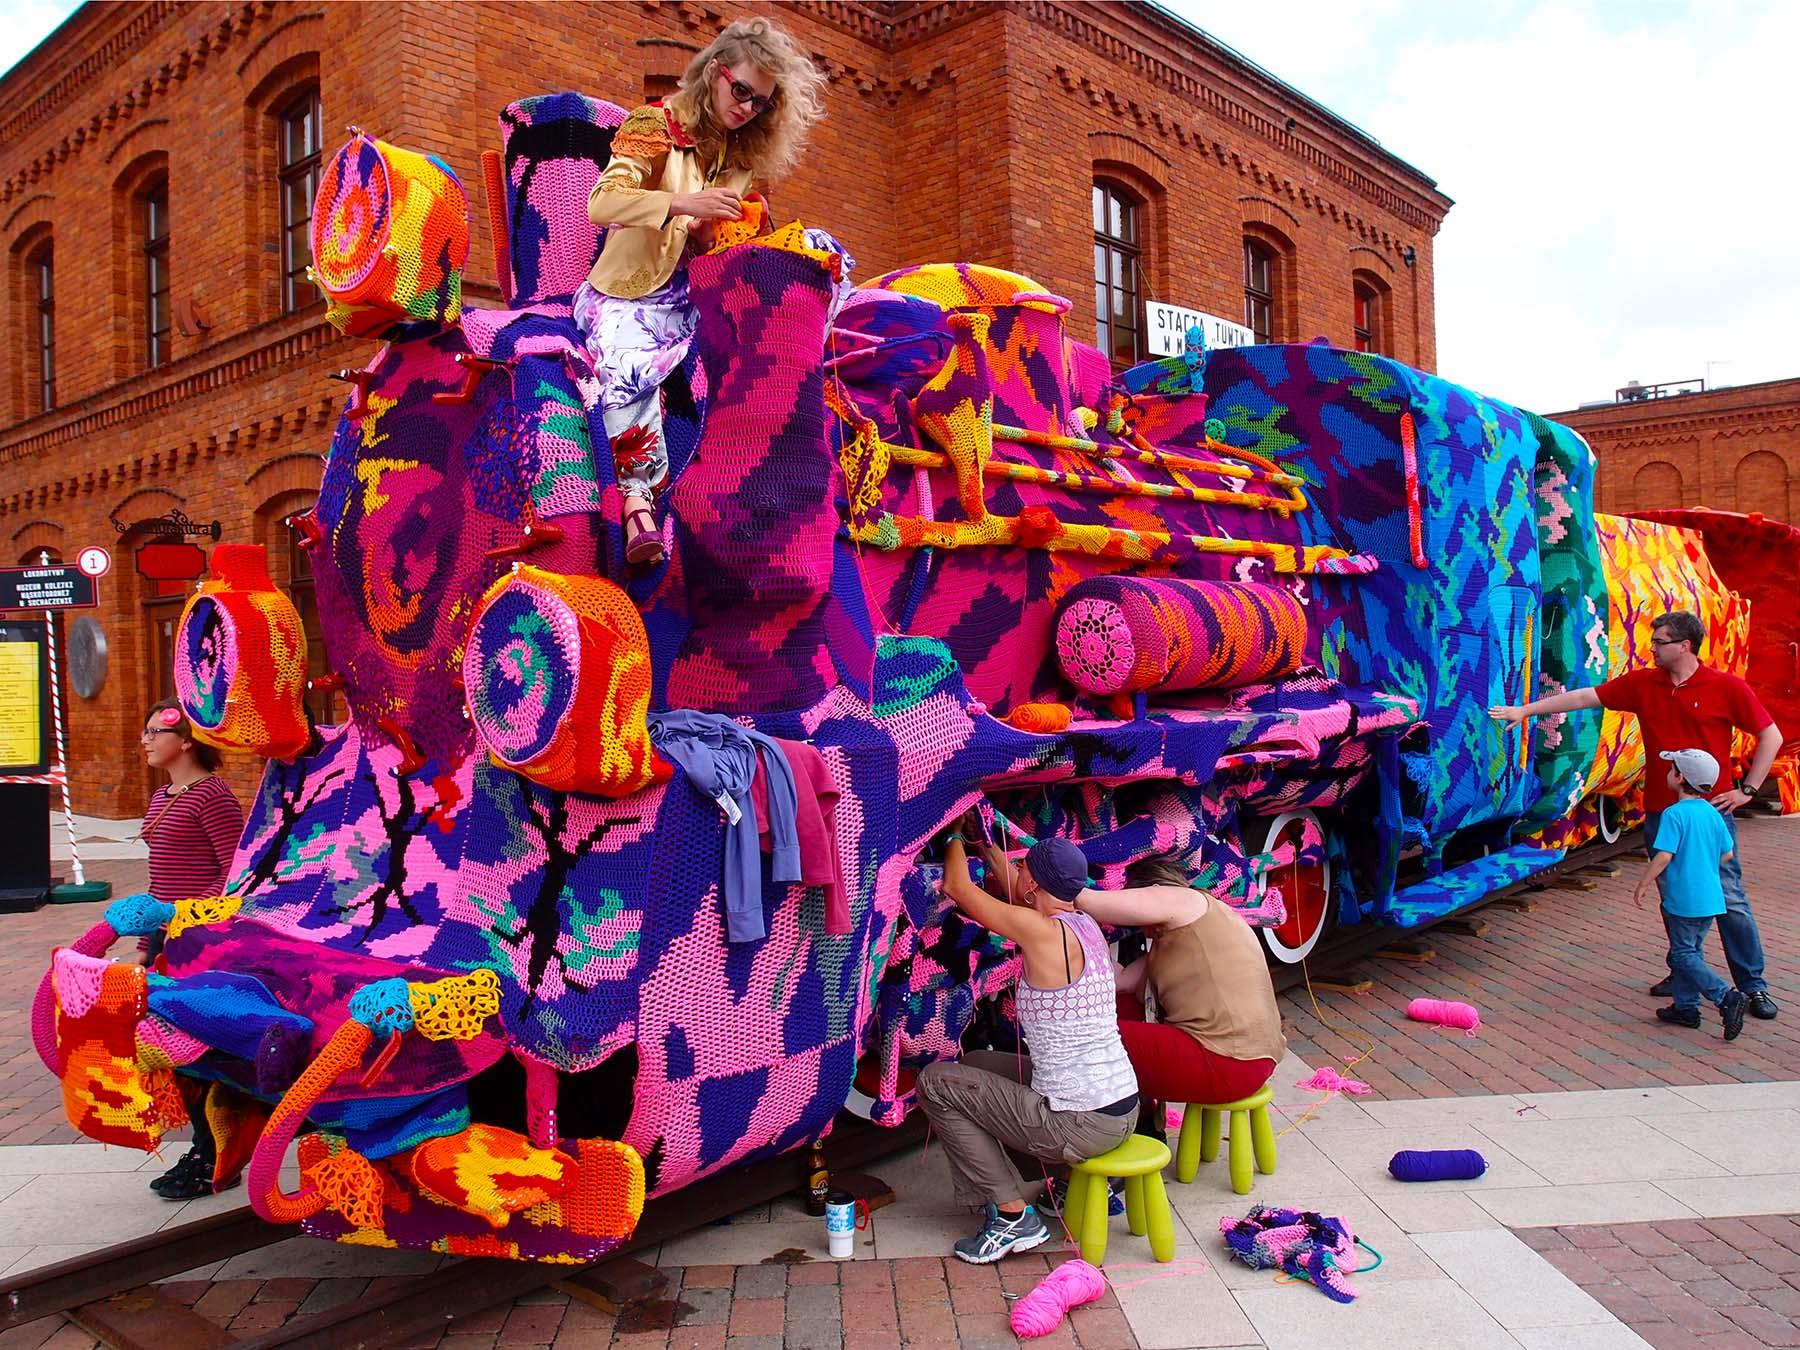 crochet bomb, ole, yarn boming, new york, polish artist